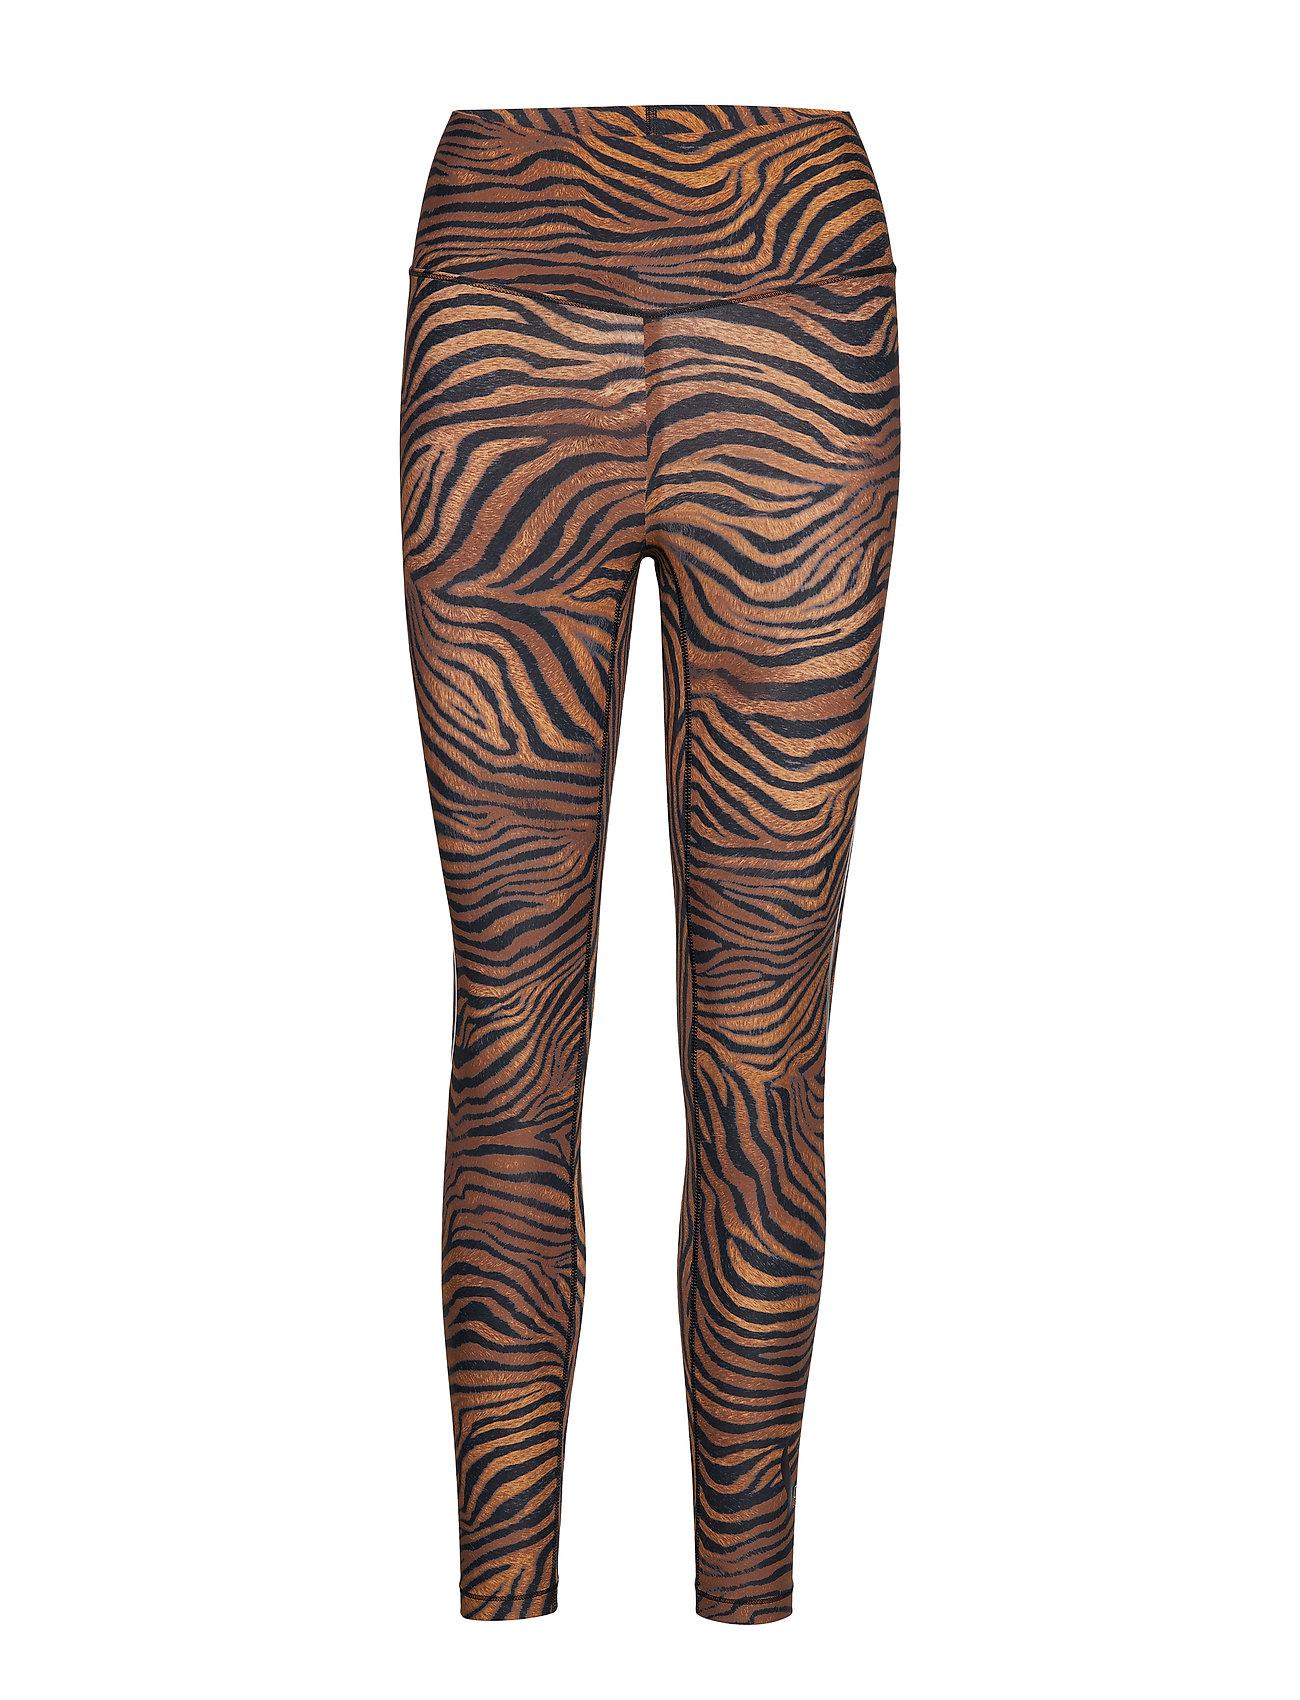 Casall Sculpture Heritage Tiger Tights - HERITAGE TIGER